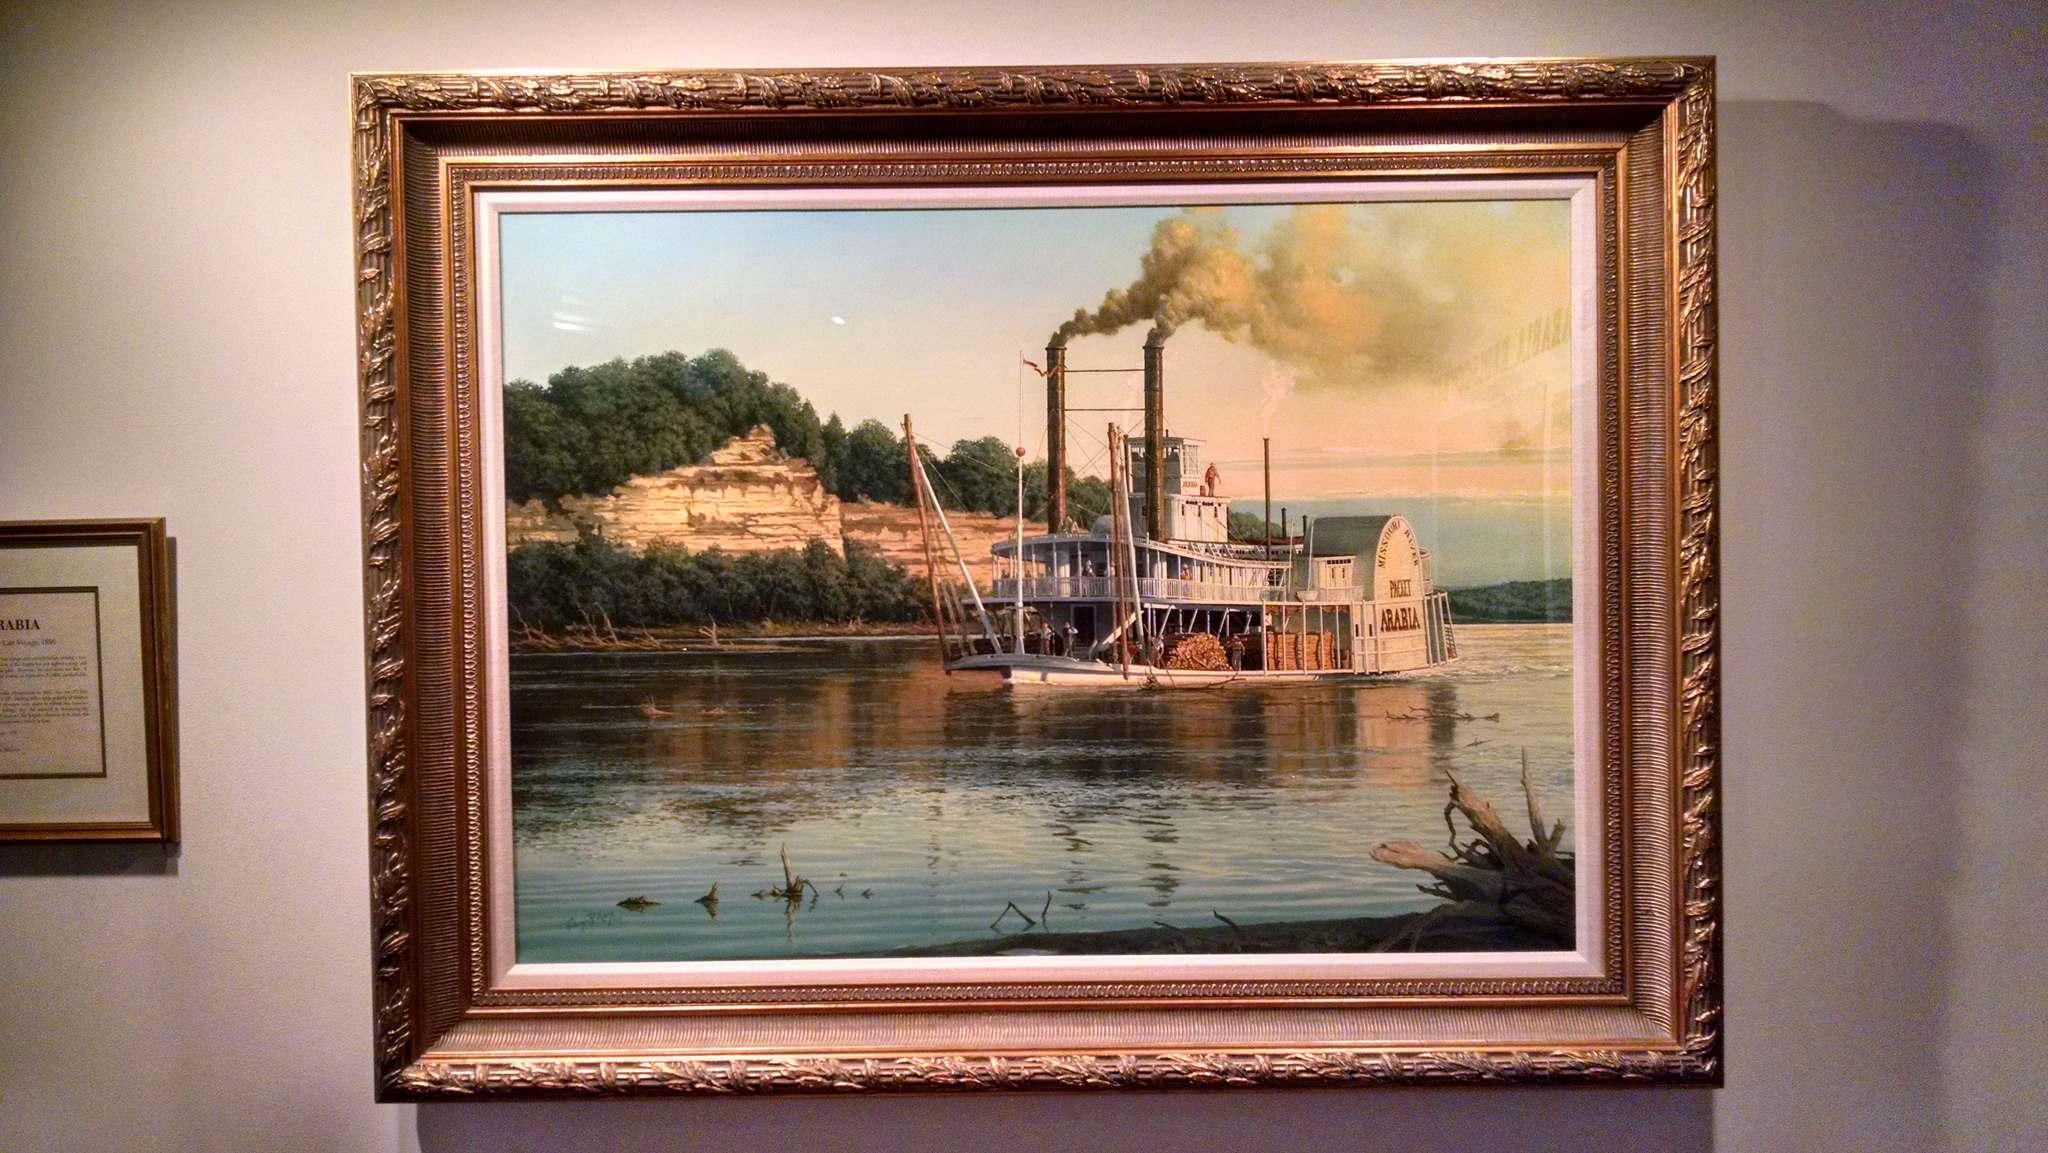 steamboat arabia History of Pioneering Midwest   Steamboat Arabia Museum in Kansas City